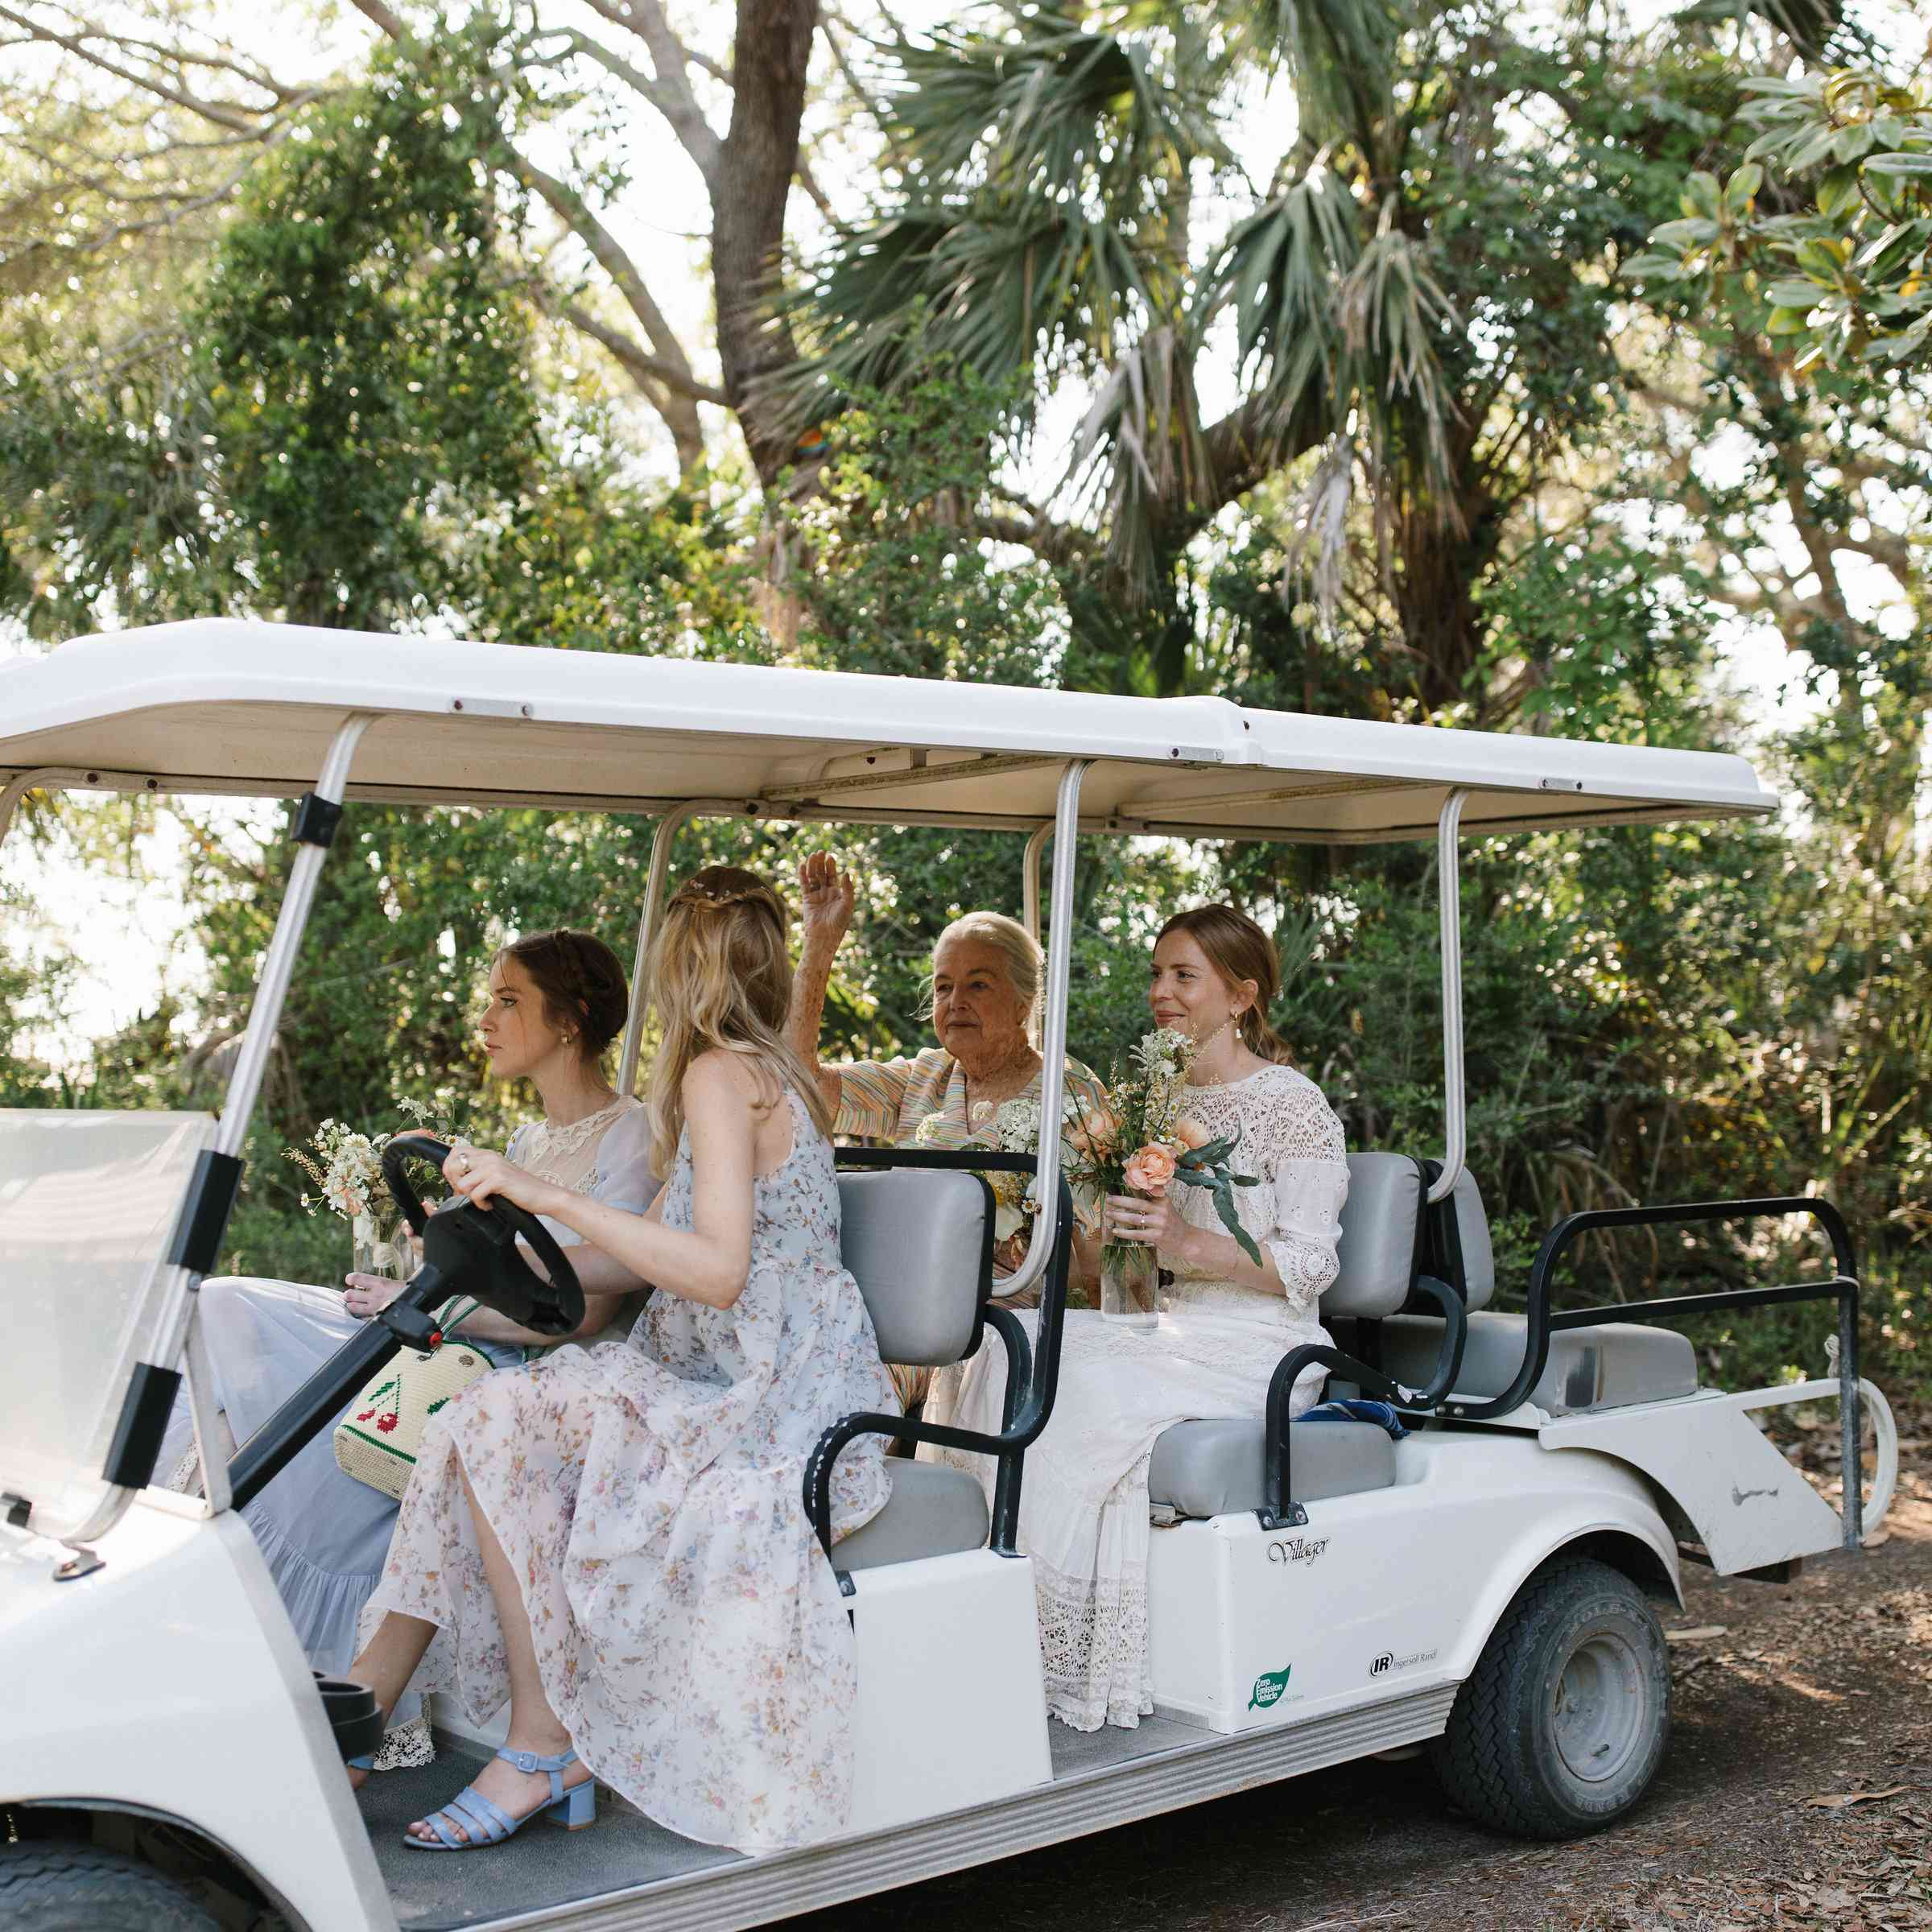 <p>bridal party in golf cart wedding transportation</p><br><br>